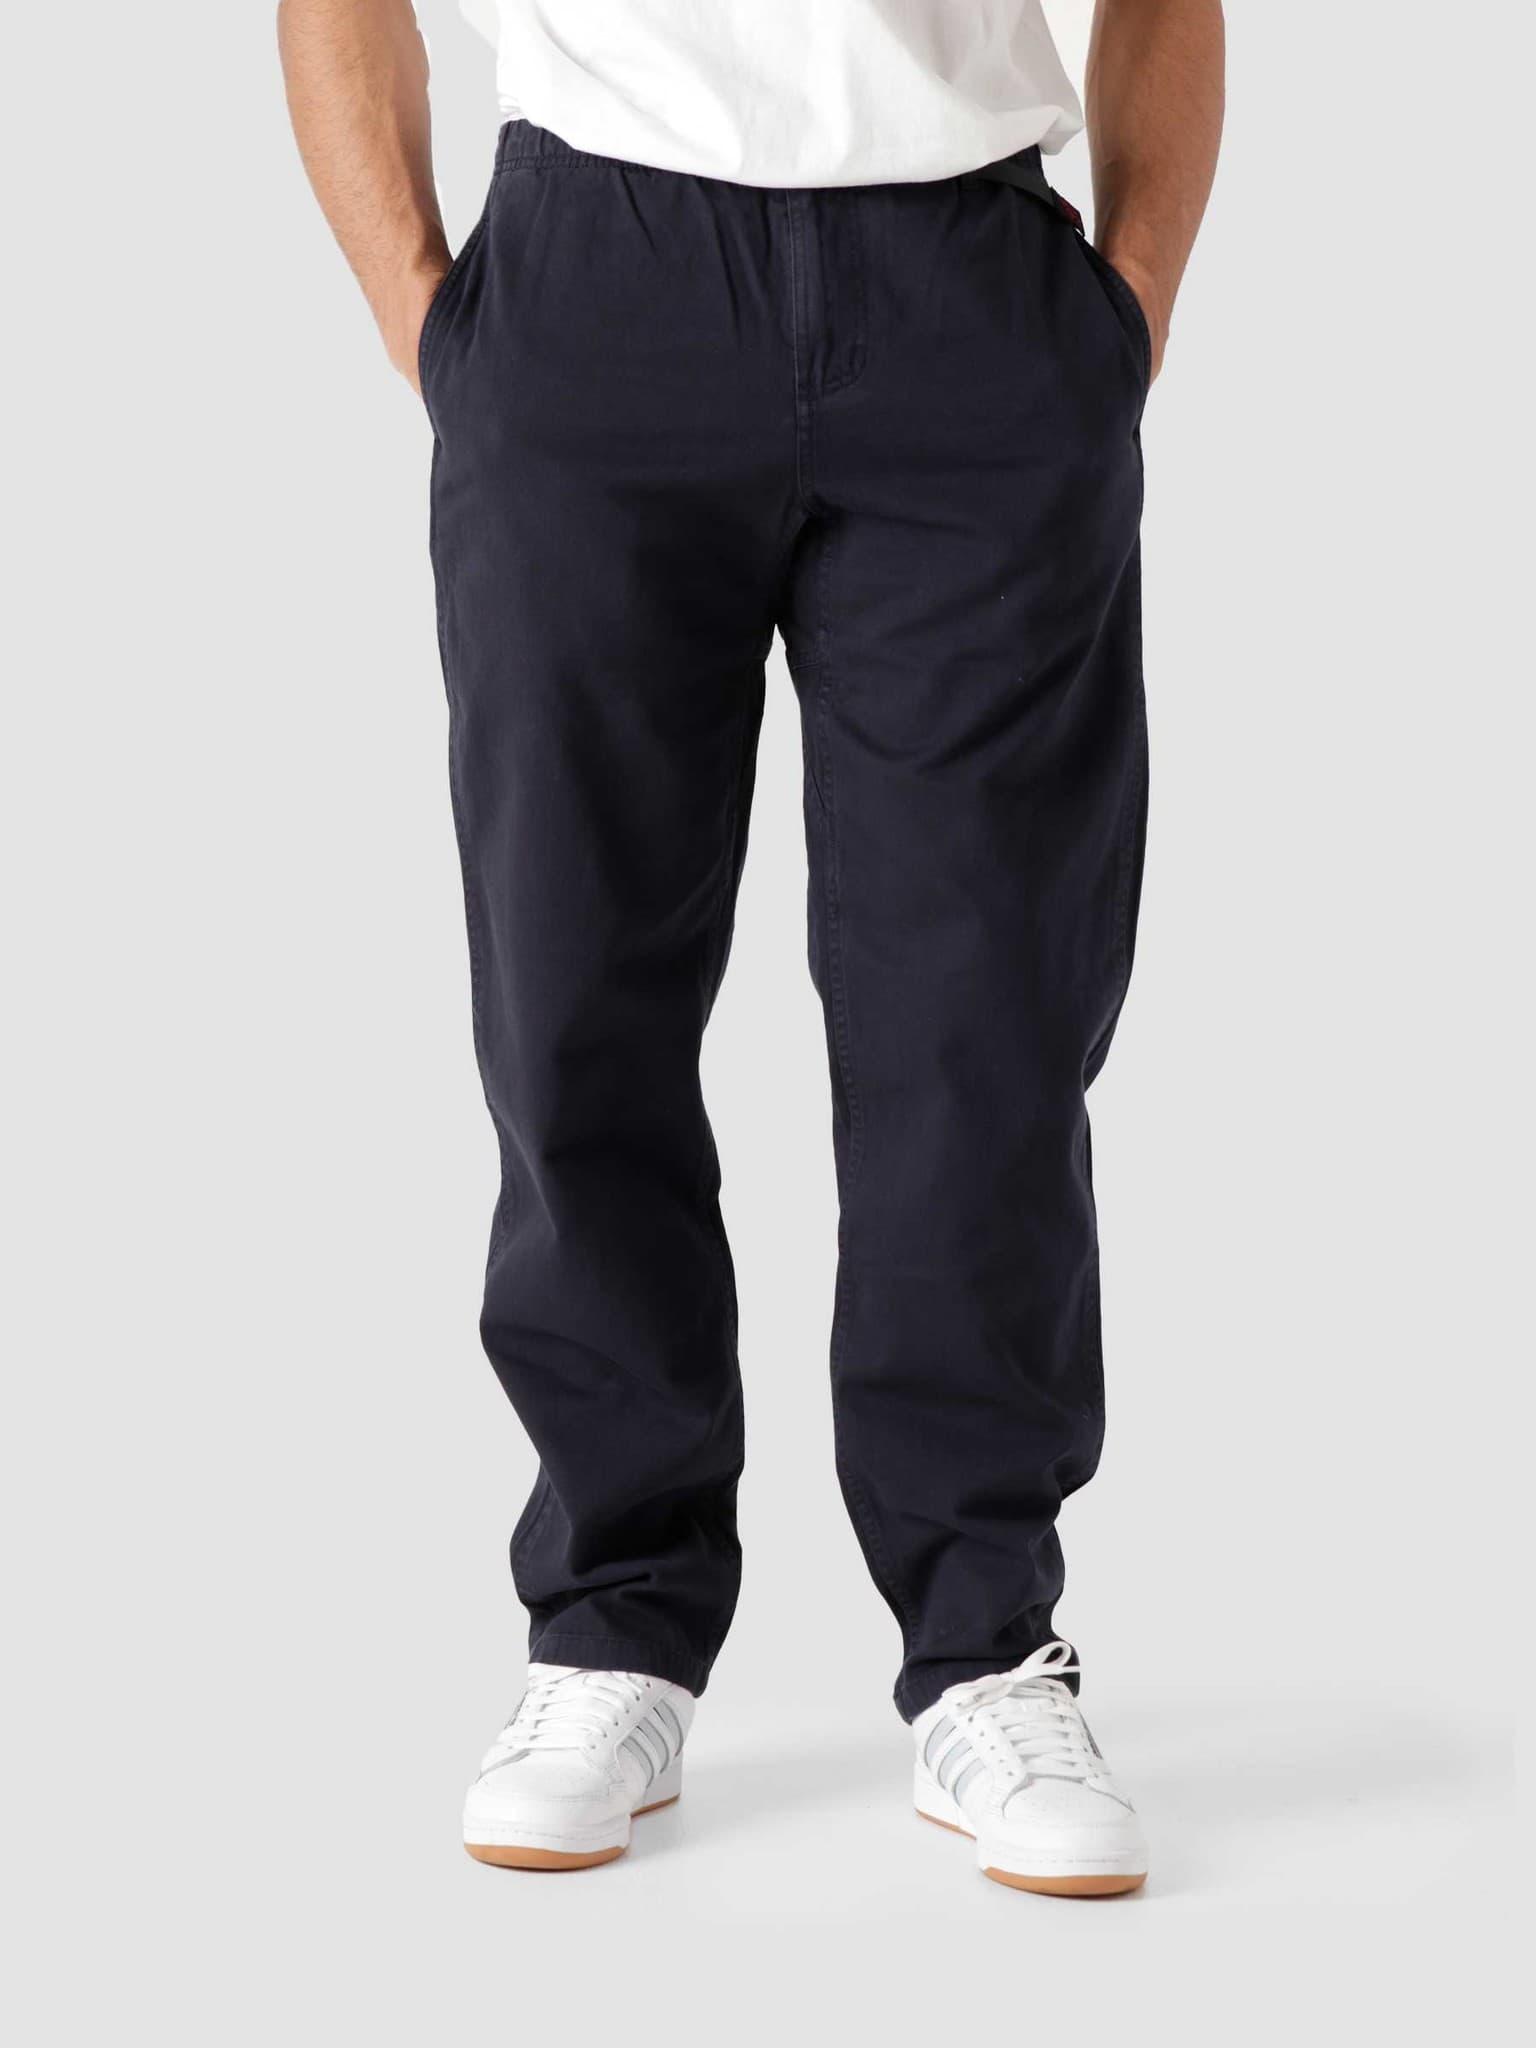 Pants Double Navy 8657-56J